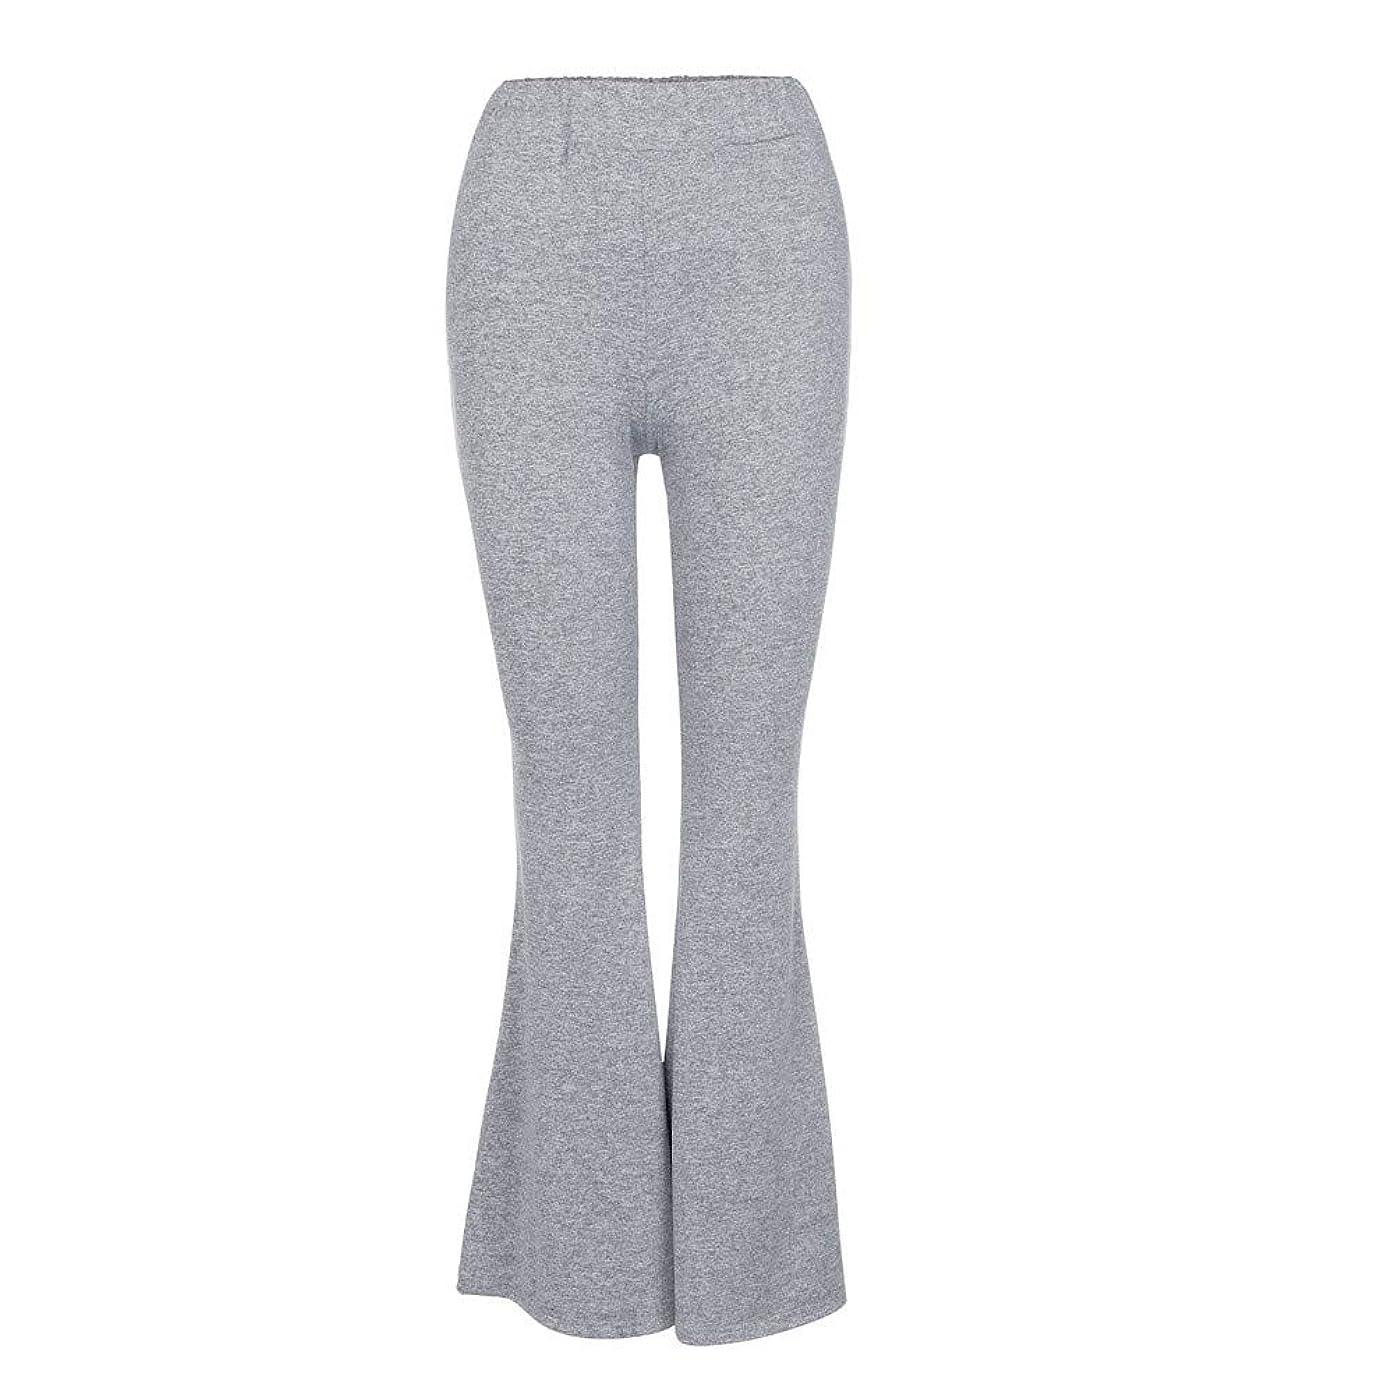 Todaies Womens Wide Leg Lounge Pants,Comfy Stretch Floral Print Drawstring Palazzo Pants … (2XL, Gray)